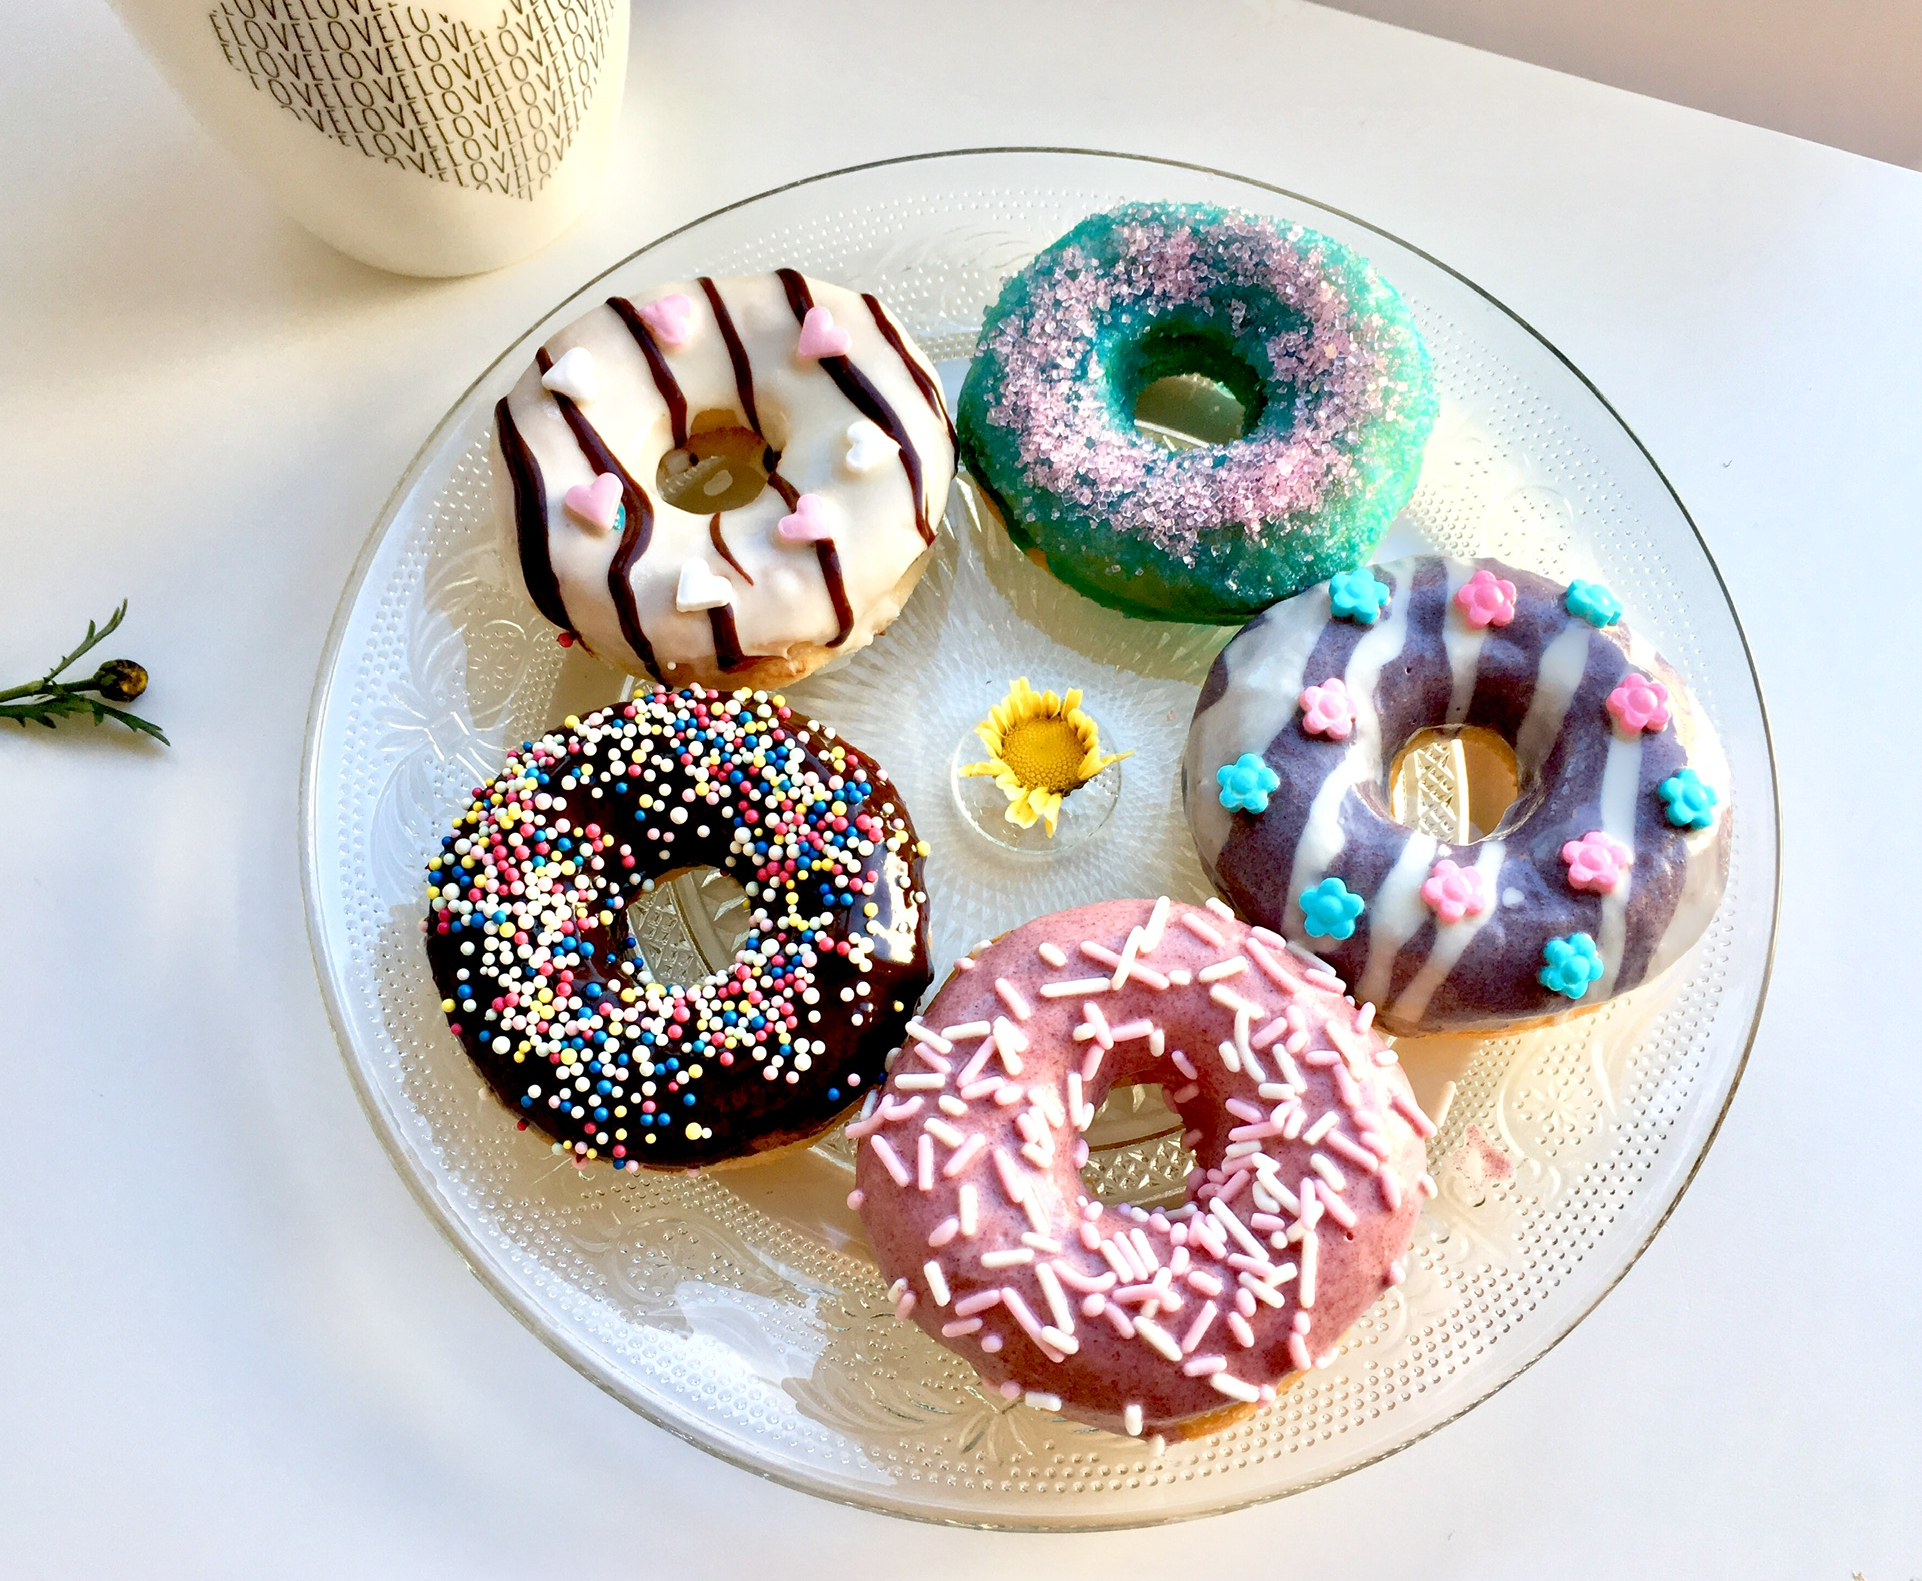 Donut Rezept – Original Amerikanische Doughnuts selber machen